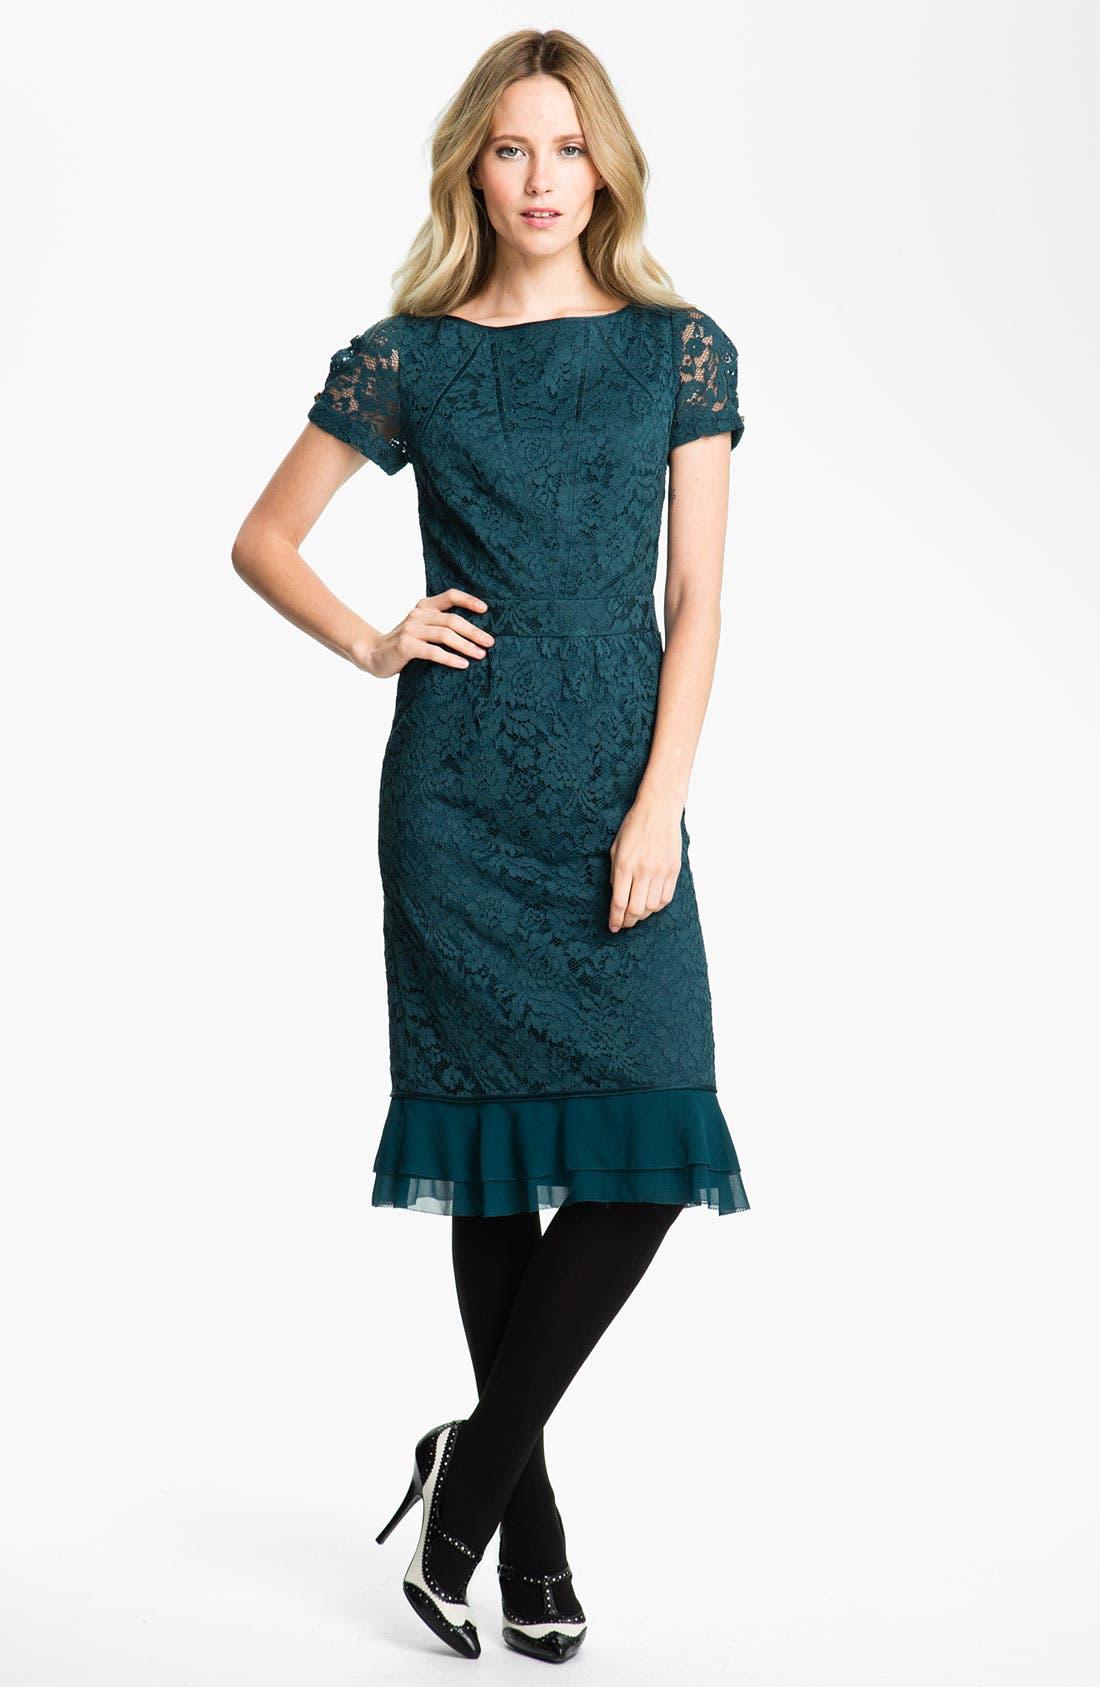 Main Image - Tory Burch 'Bovary' Lace Sheath Dress